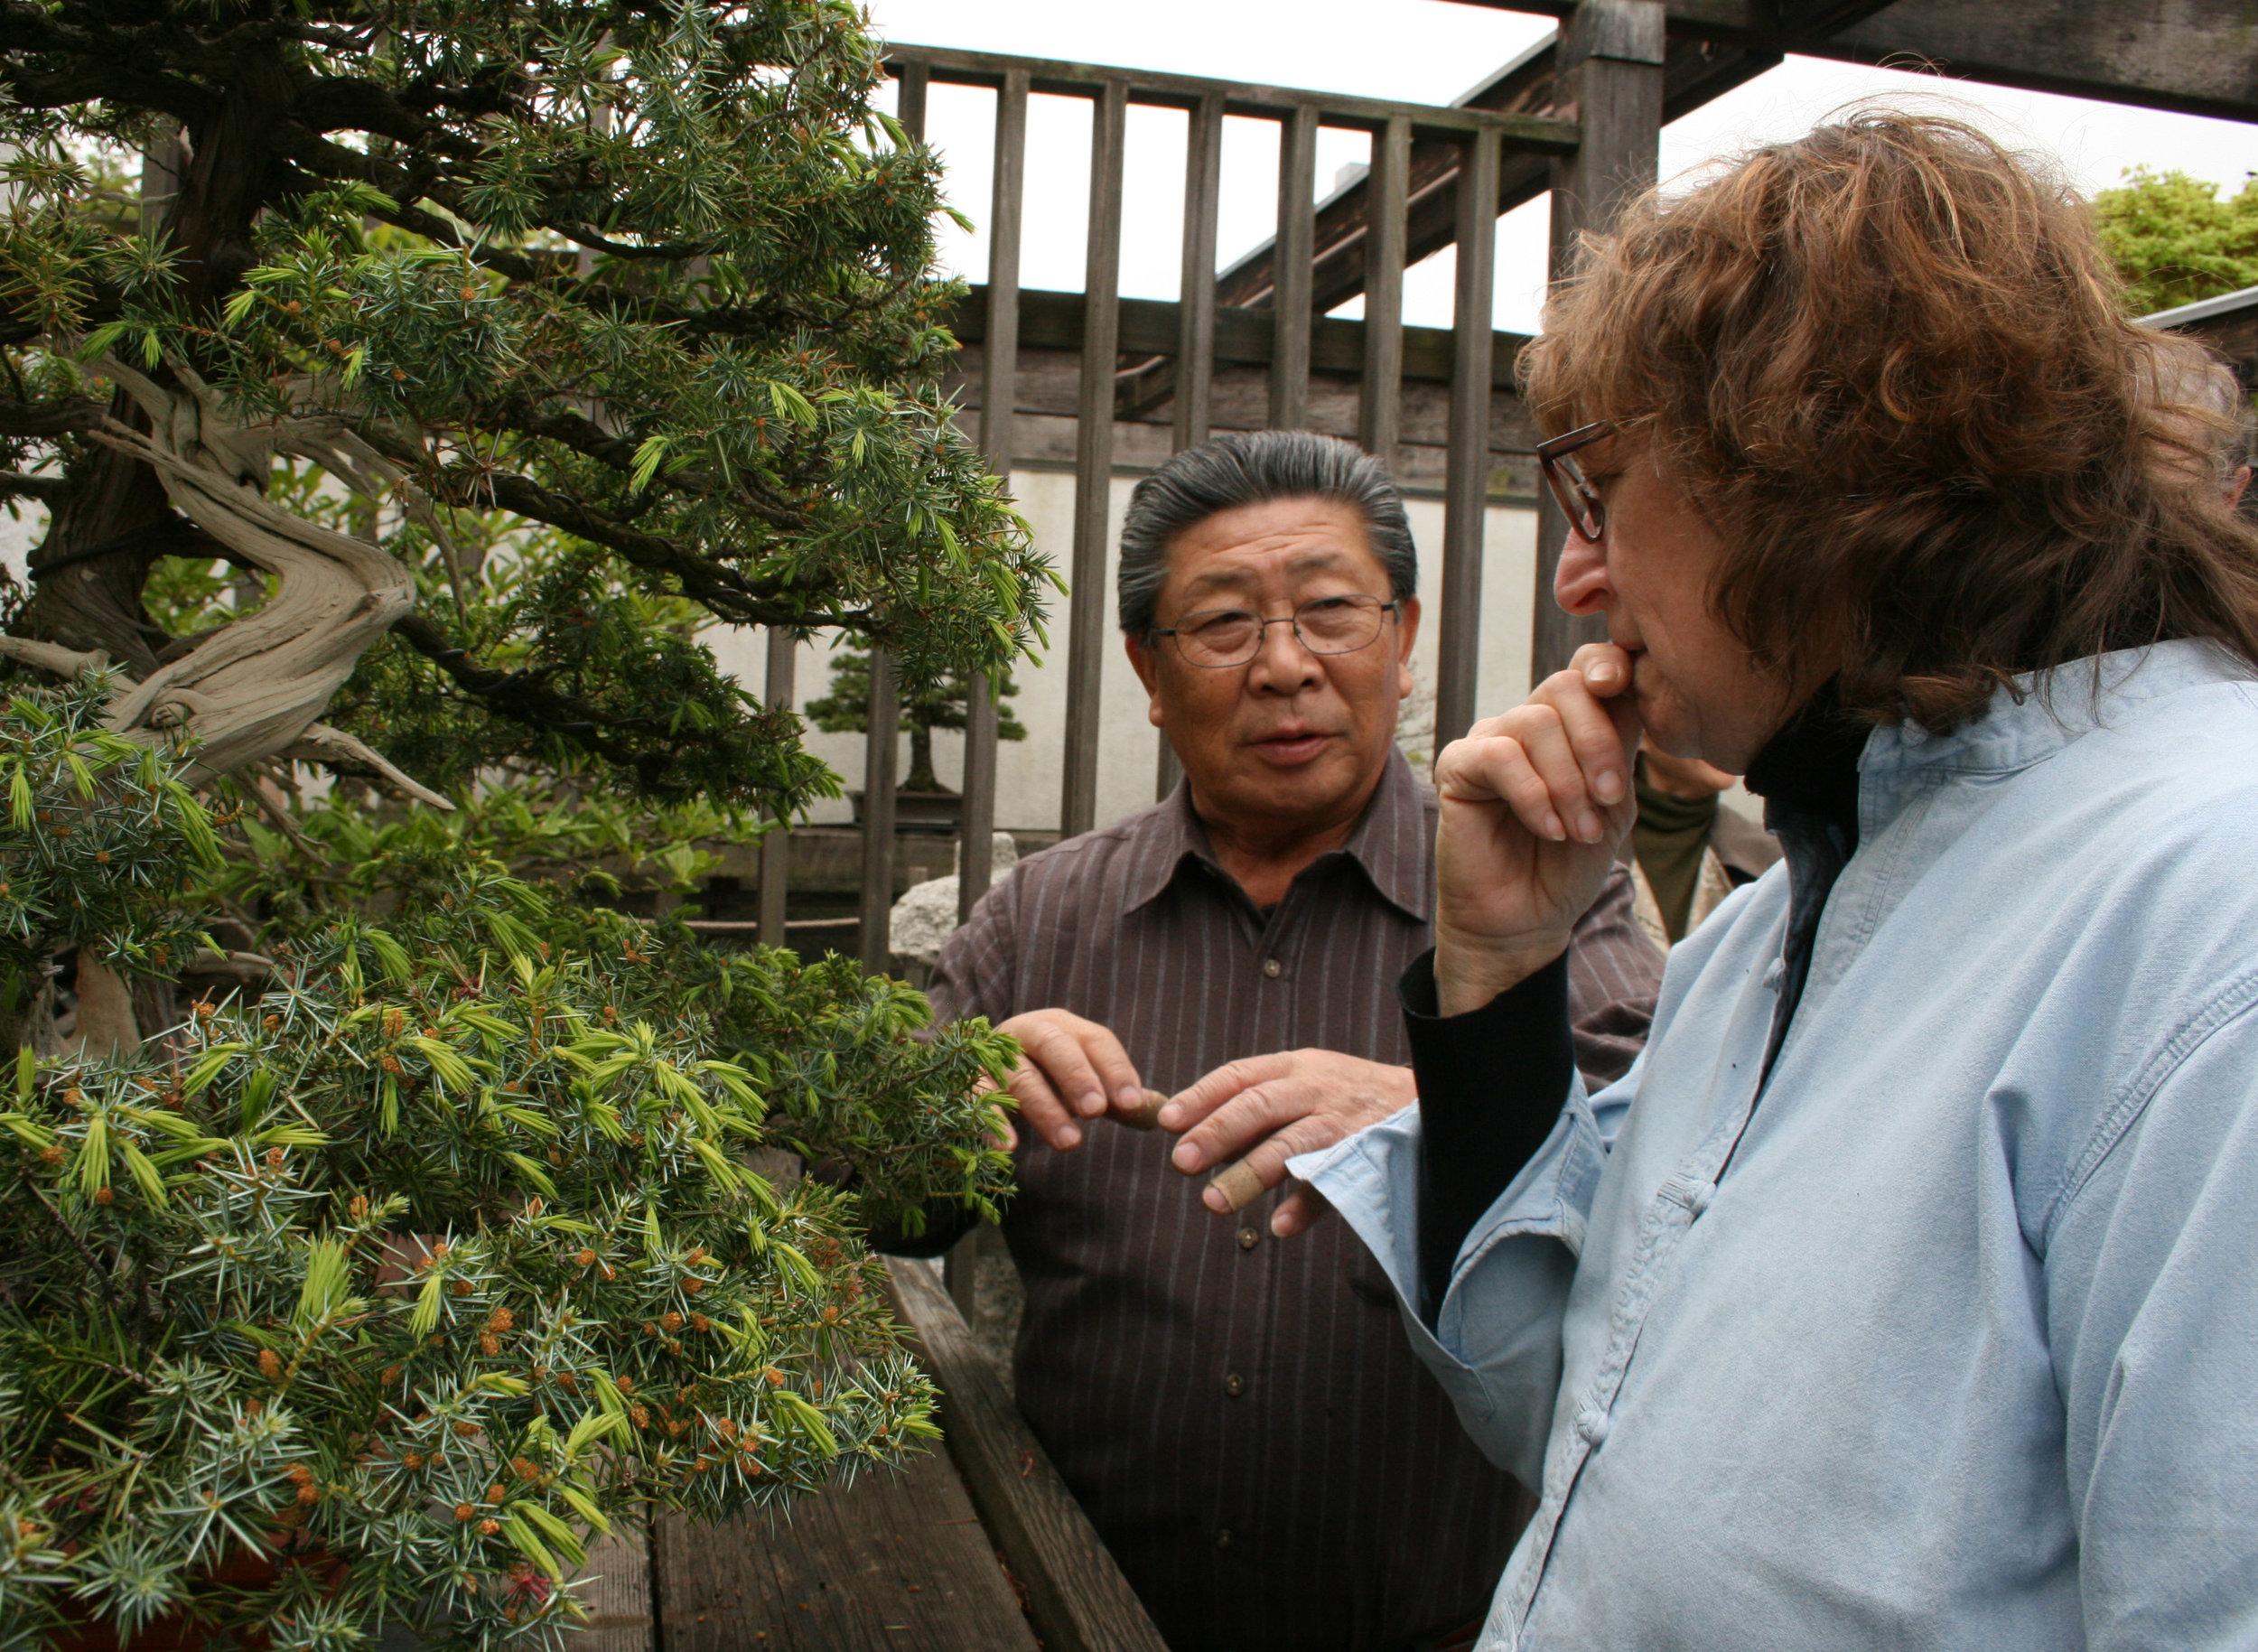 Copy of Copy of Mr. Yasuo Mitsuya and Kathy Shaner